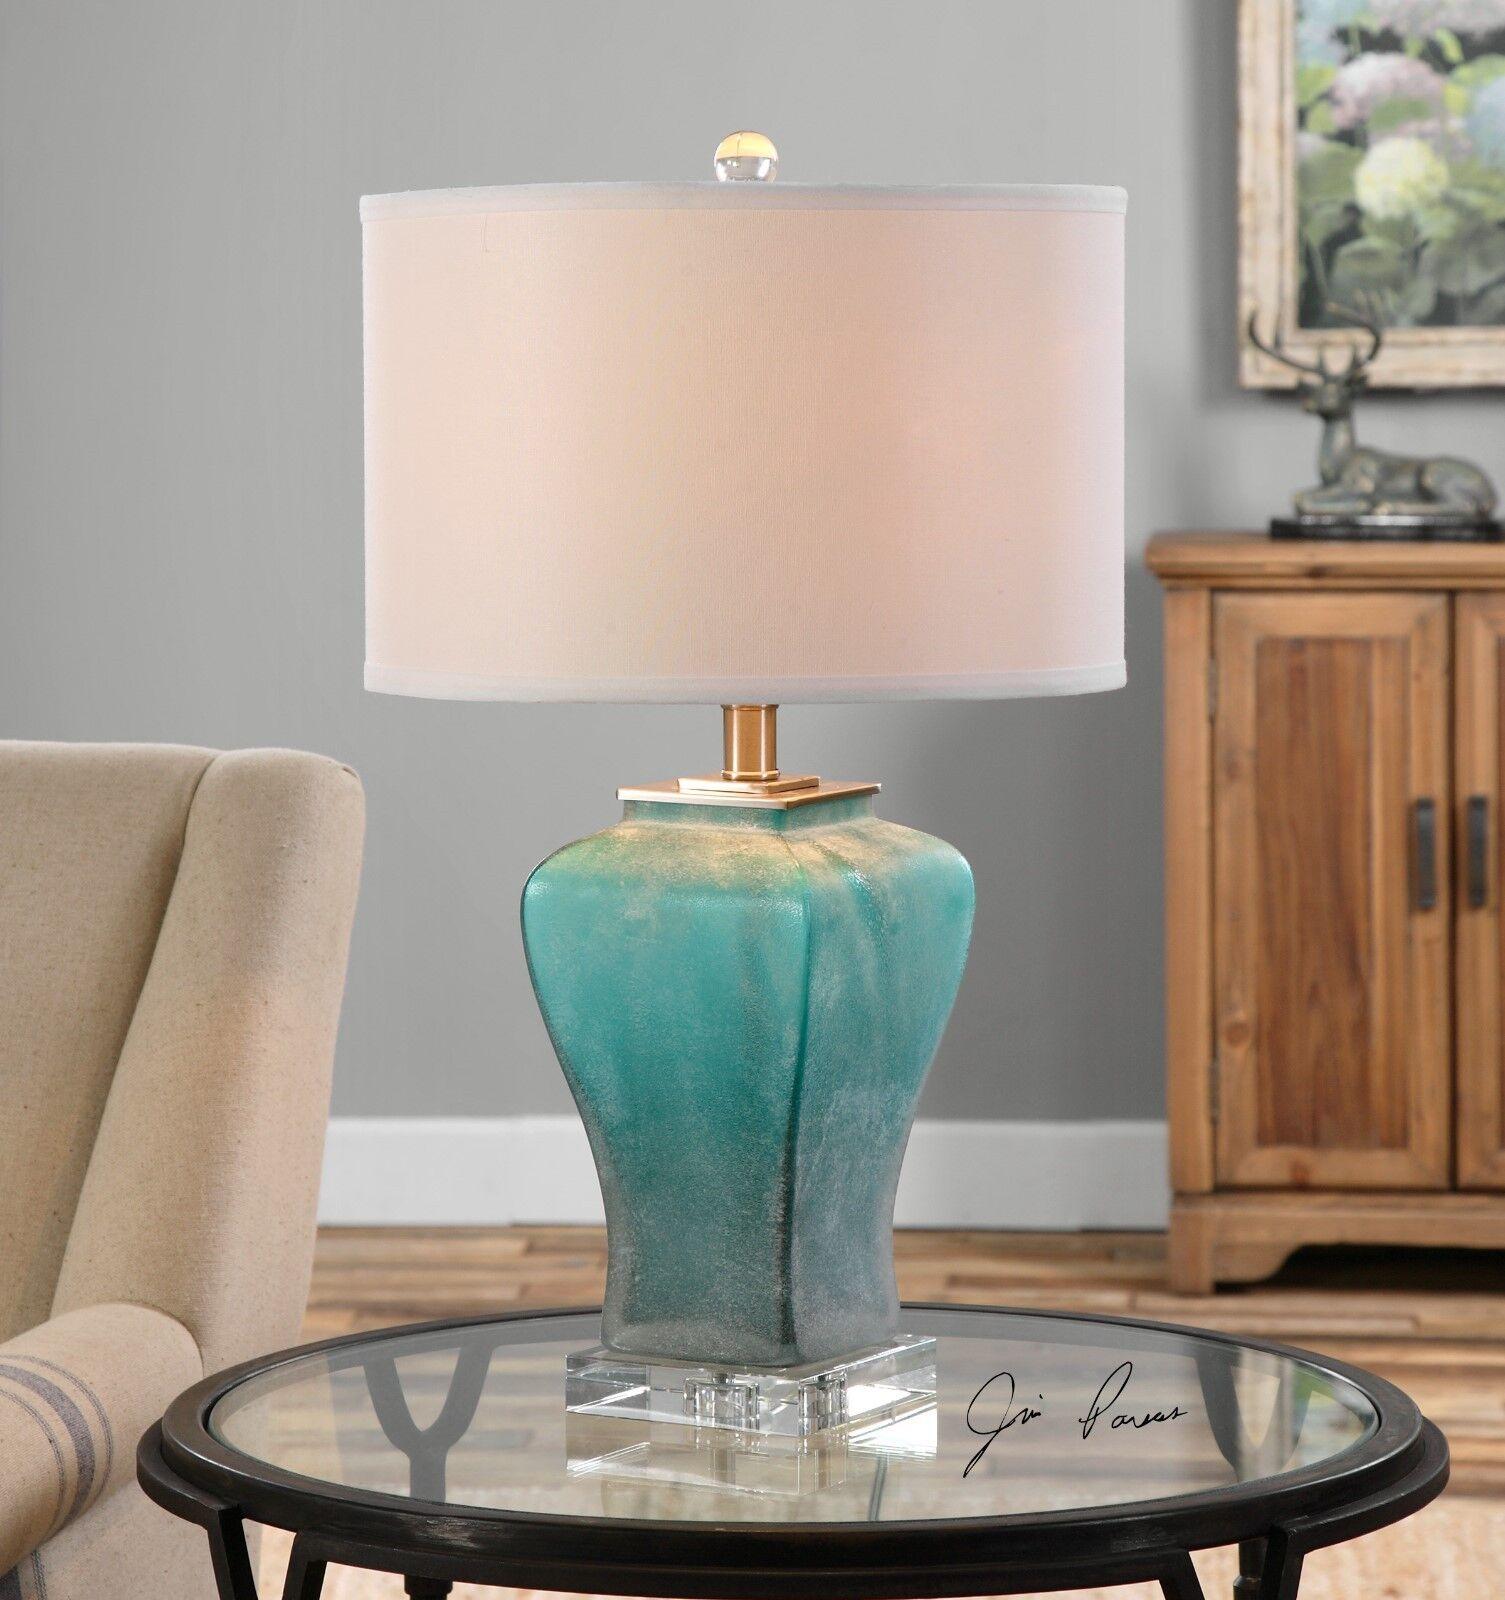 ELEGANT FROSTED Blau Grün GLASS TABLE LAMP CRYSTAL BASE BRUSHED ALUMINUM METAL